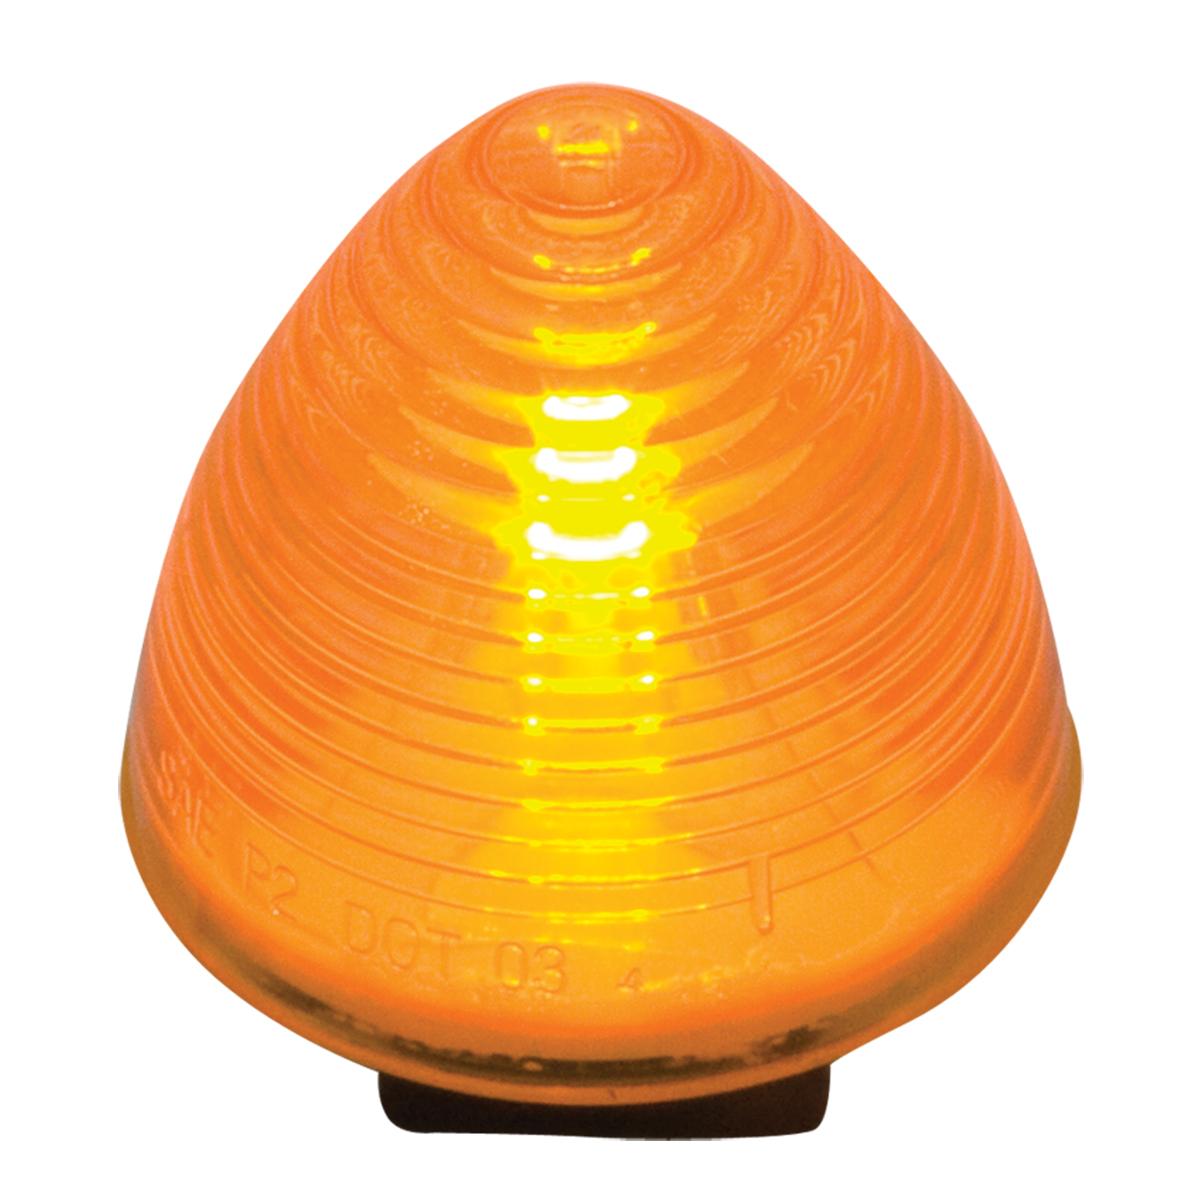 "#80942 2"" Incandescent Beehive Amber/Amber Light"